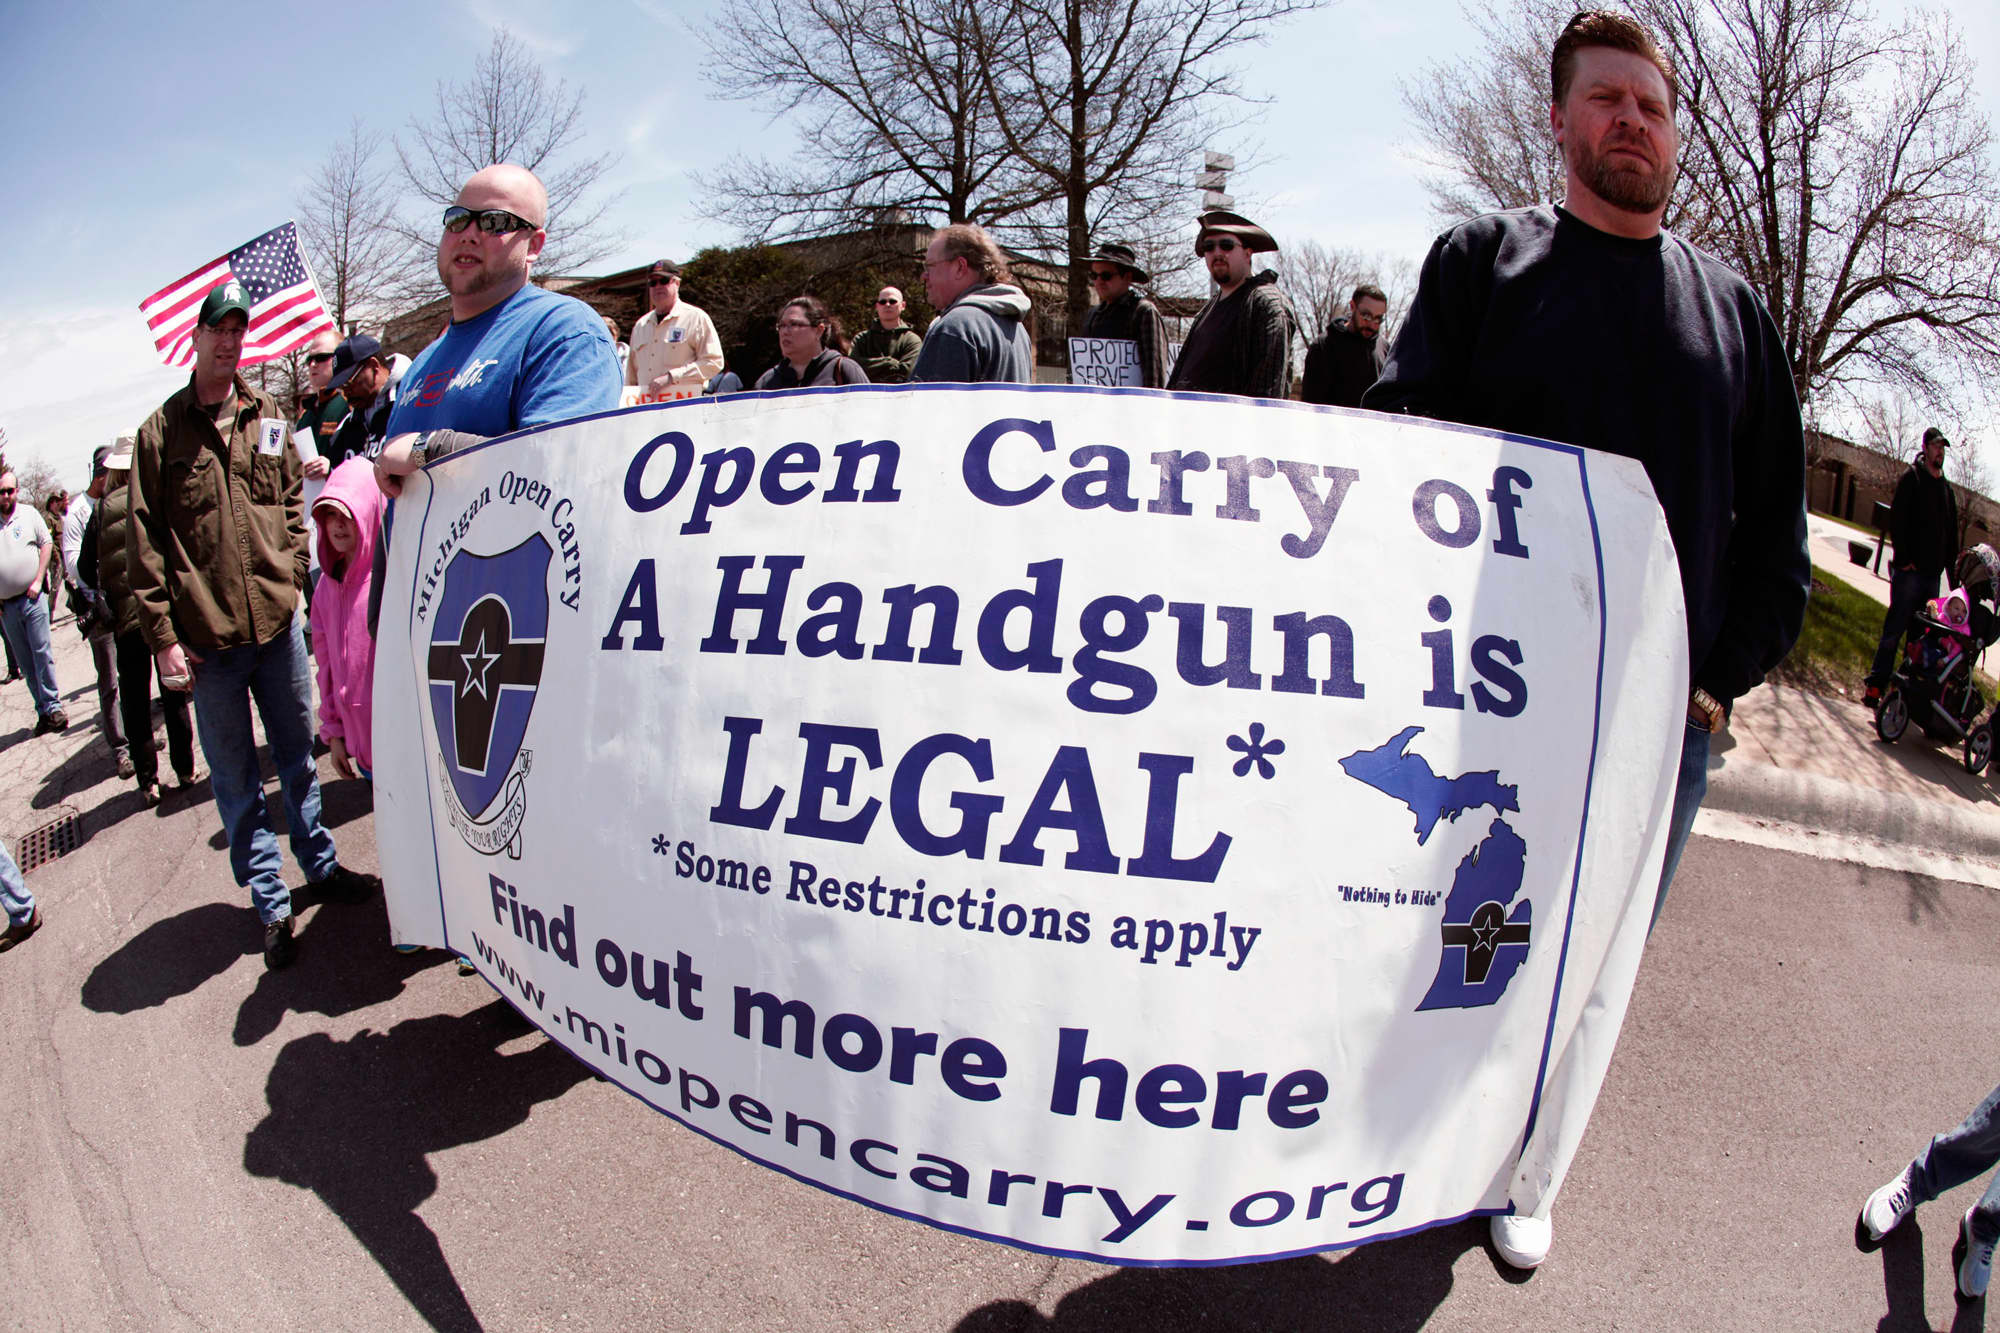 colorado open carry laws 2020